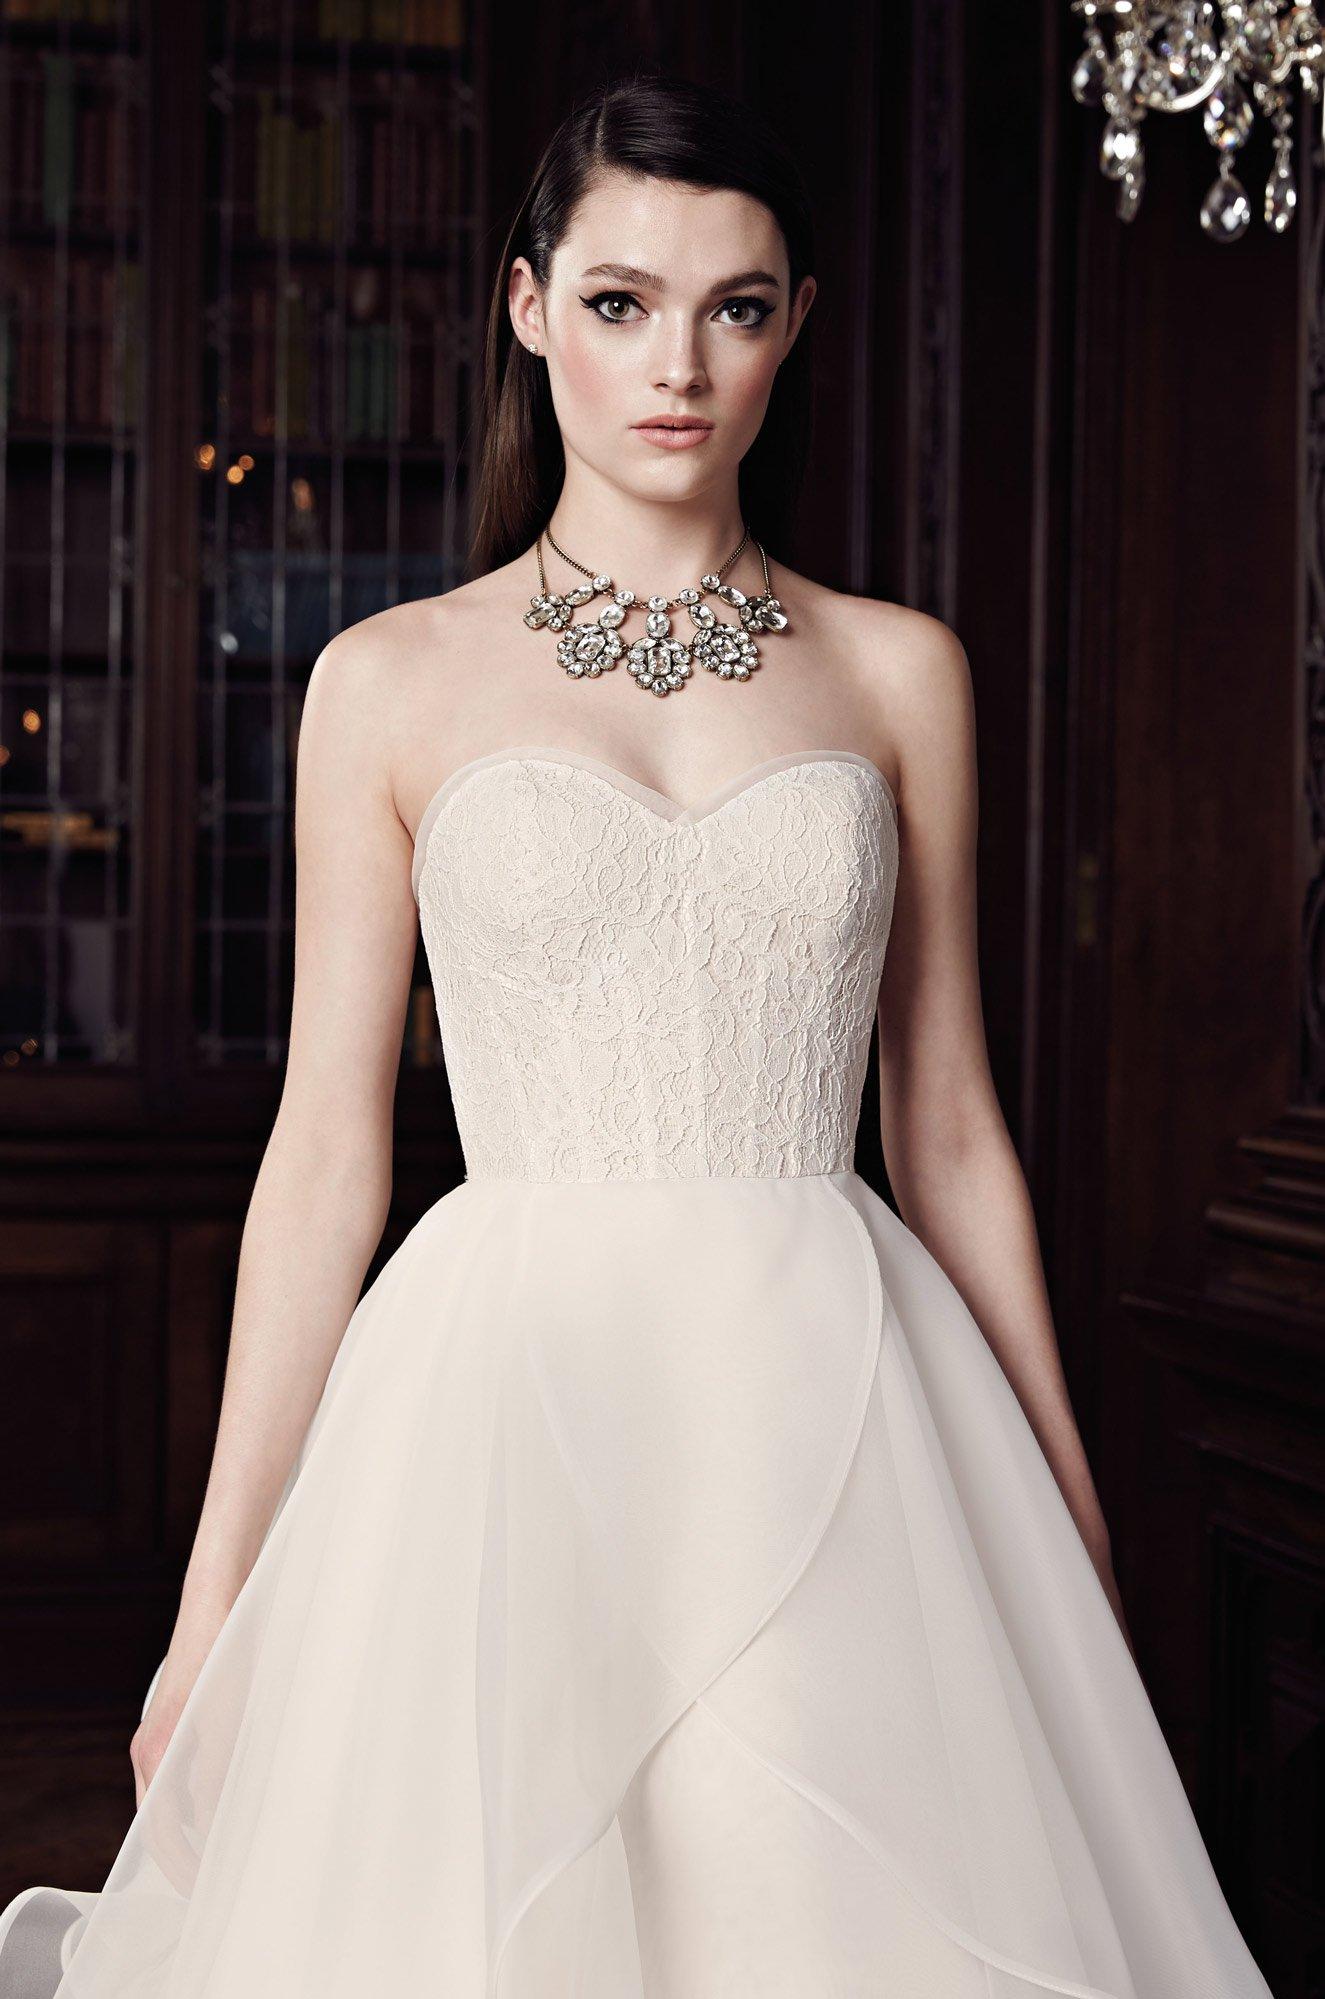 Strapless Ball Gown Wedding Dress - Style #2003   Mikaella Bridal